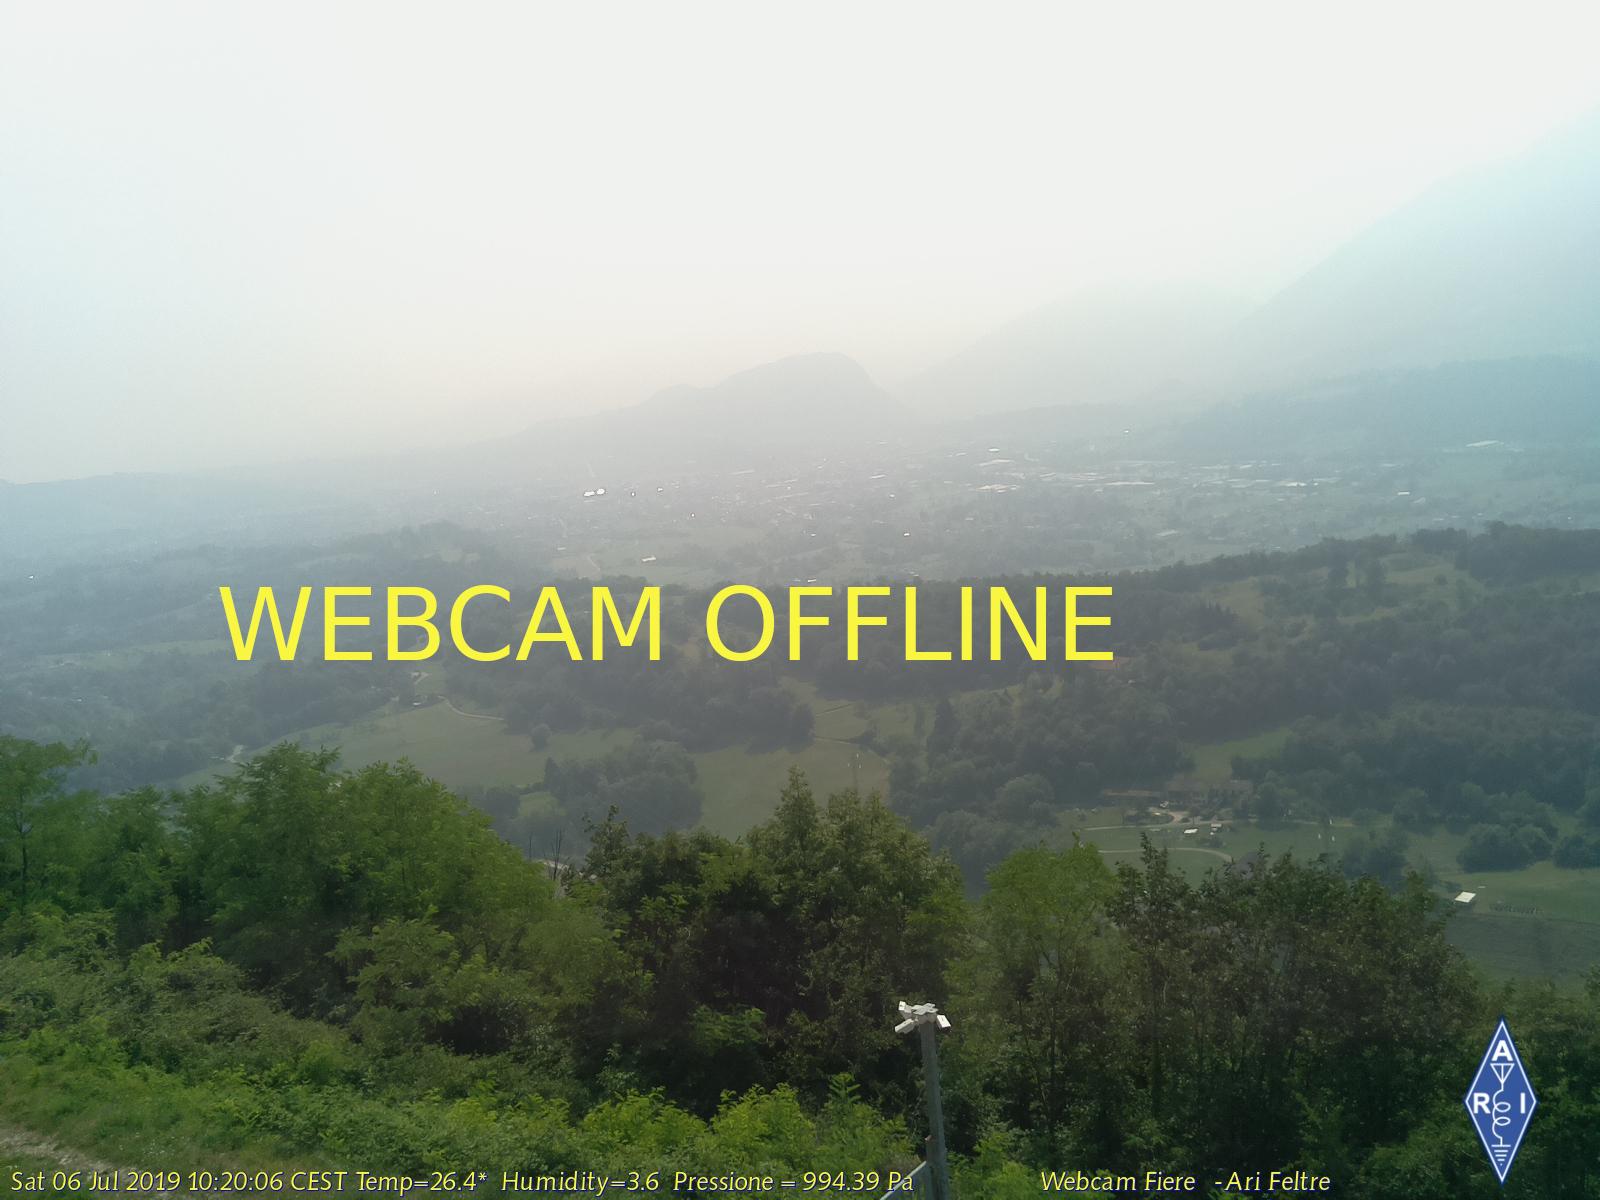 webcam - Fiere Pedavena